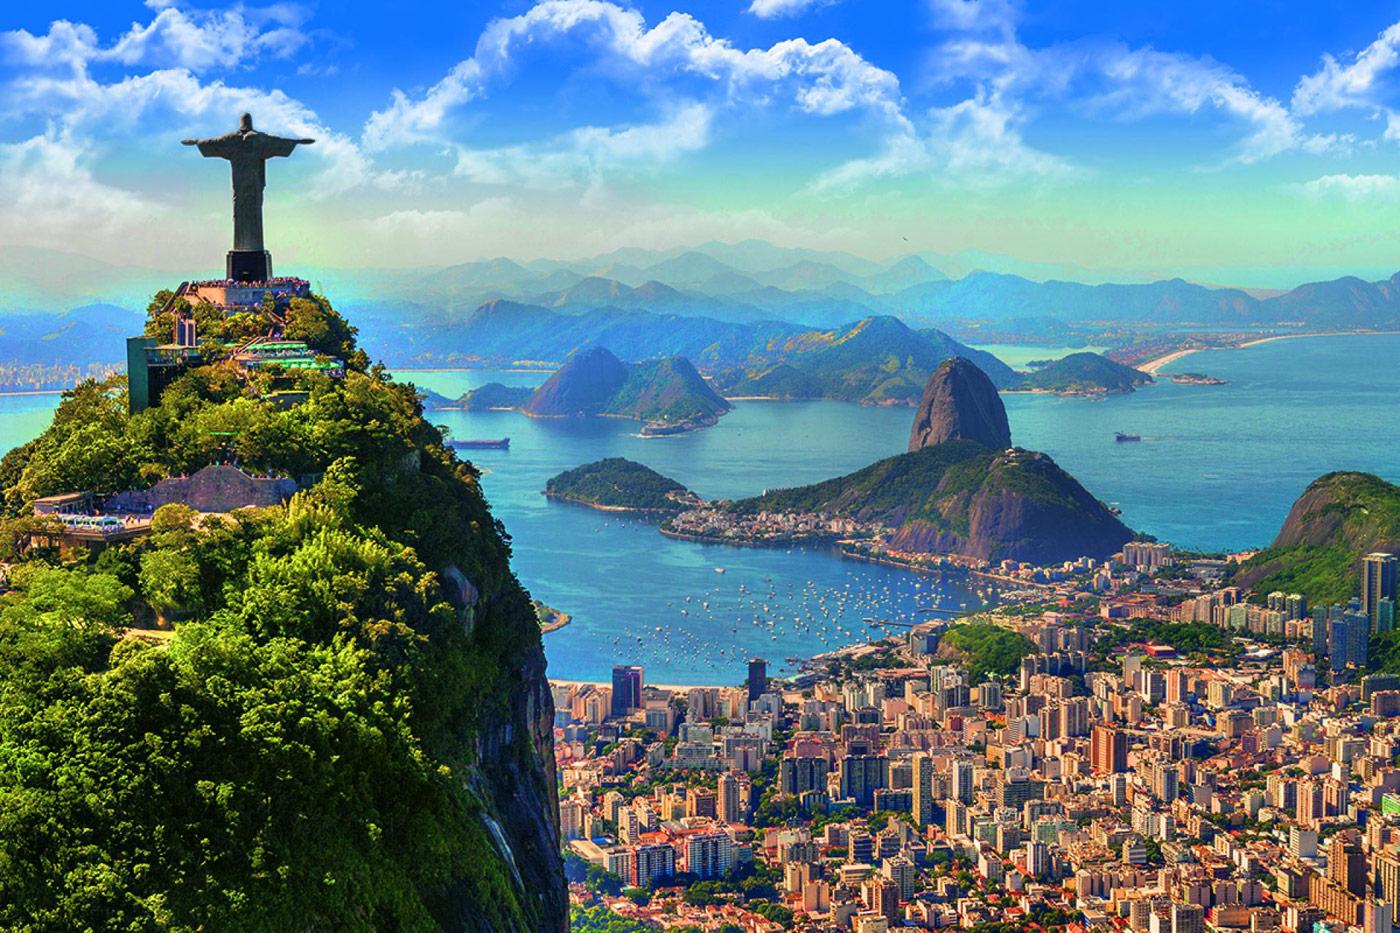 Рио-де-Жанейро — город-мечта